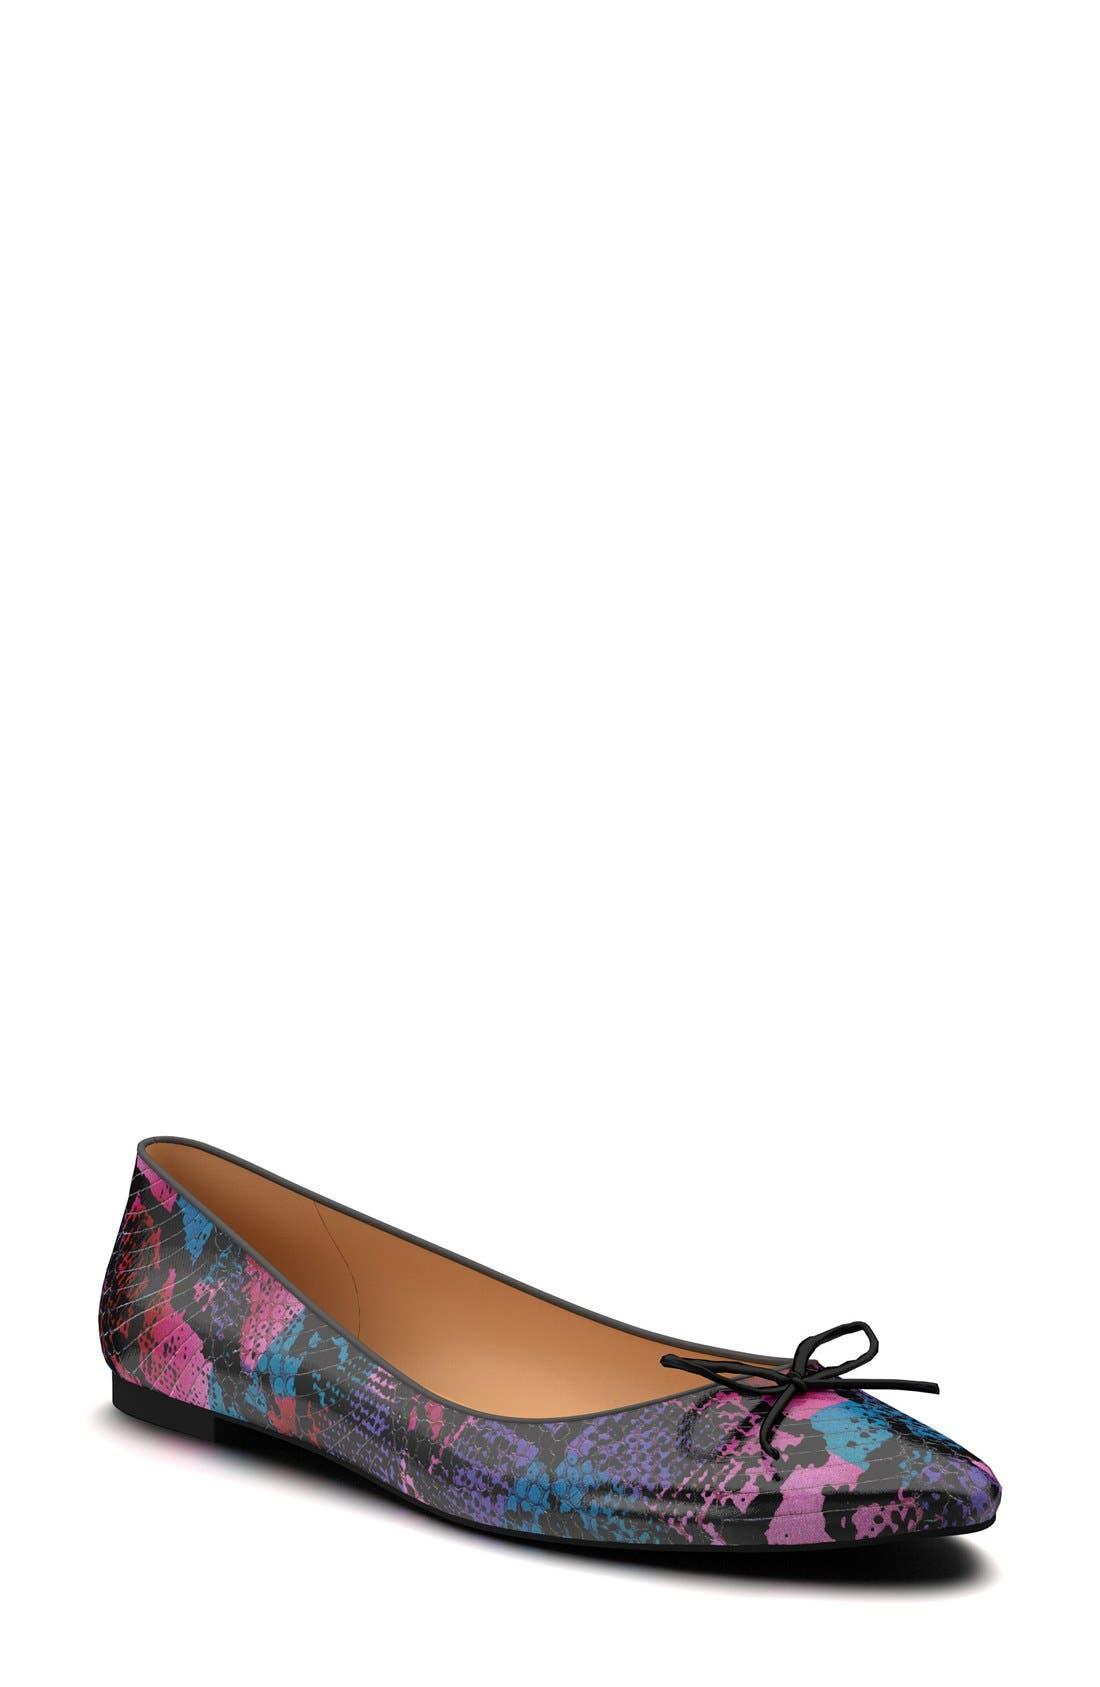 Alternate Image 1 Selected - Shoes of Prey Ballet Flat (Women)